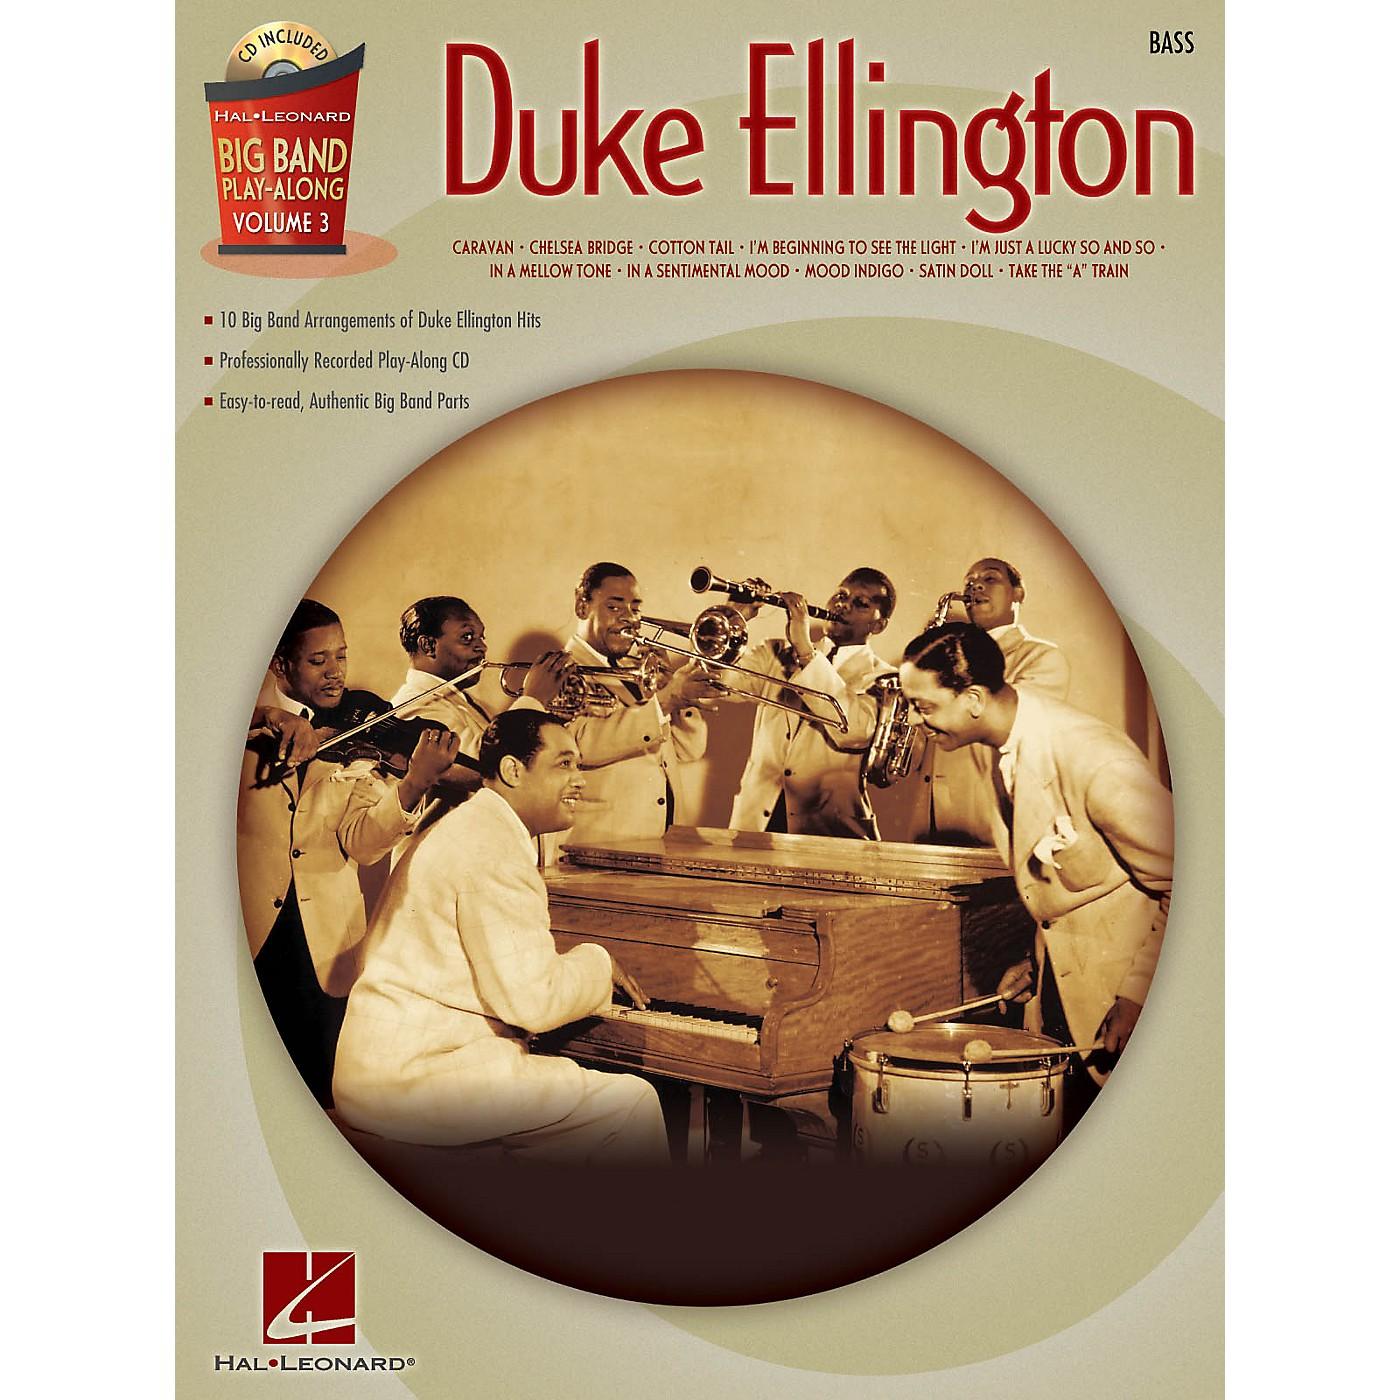 Hal Leonard Duke Ellington - Bass (Big Band Play-Along Volume 3) Big Band Play-Along Series Softcover with CD thumbnail